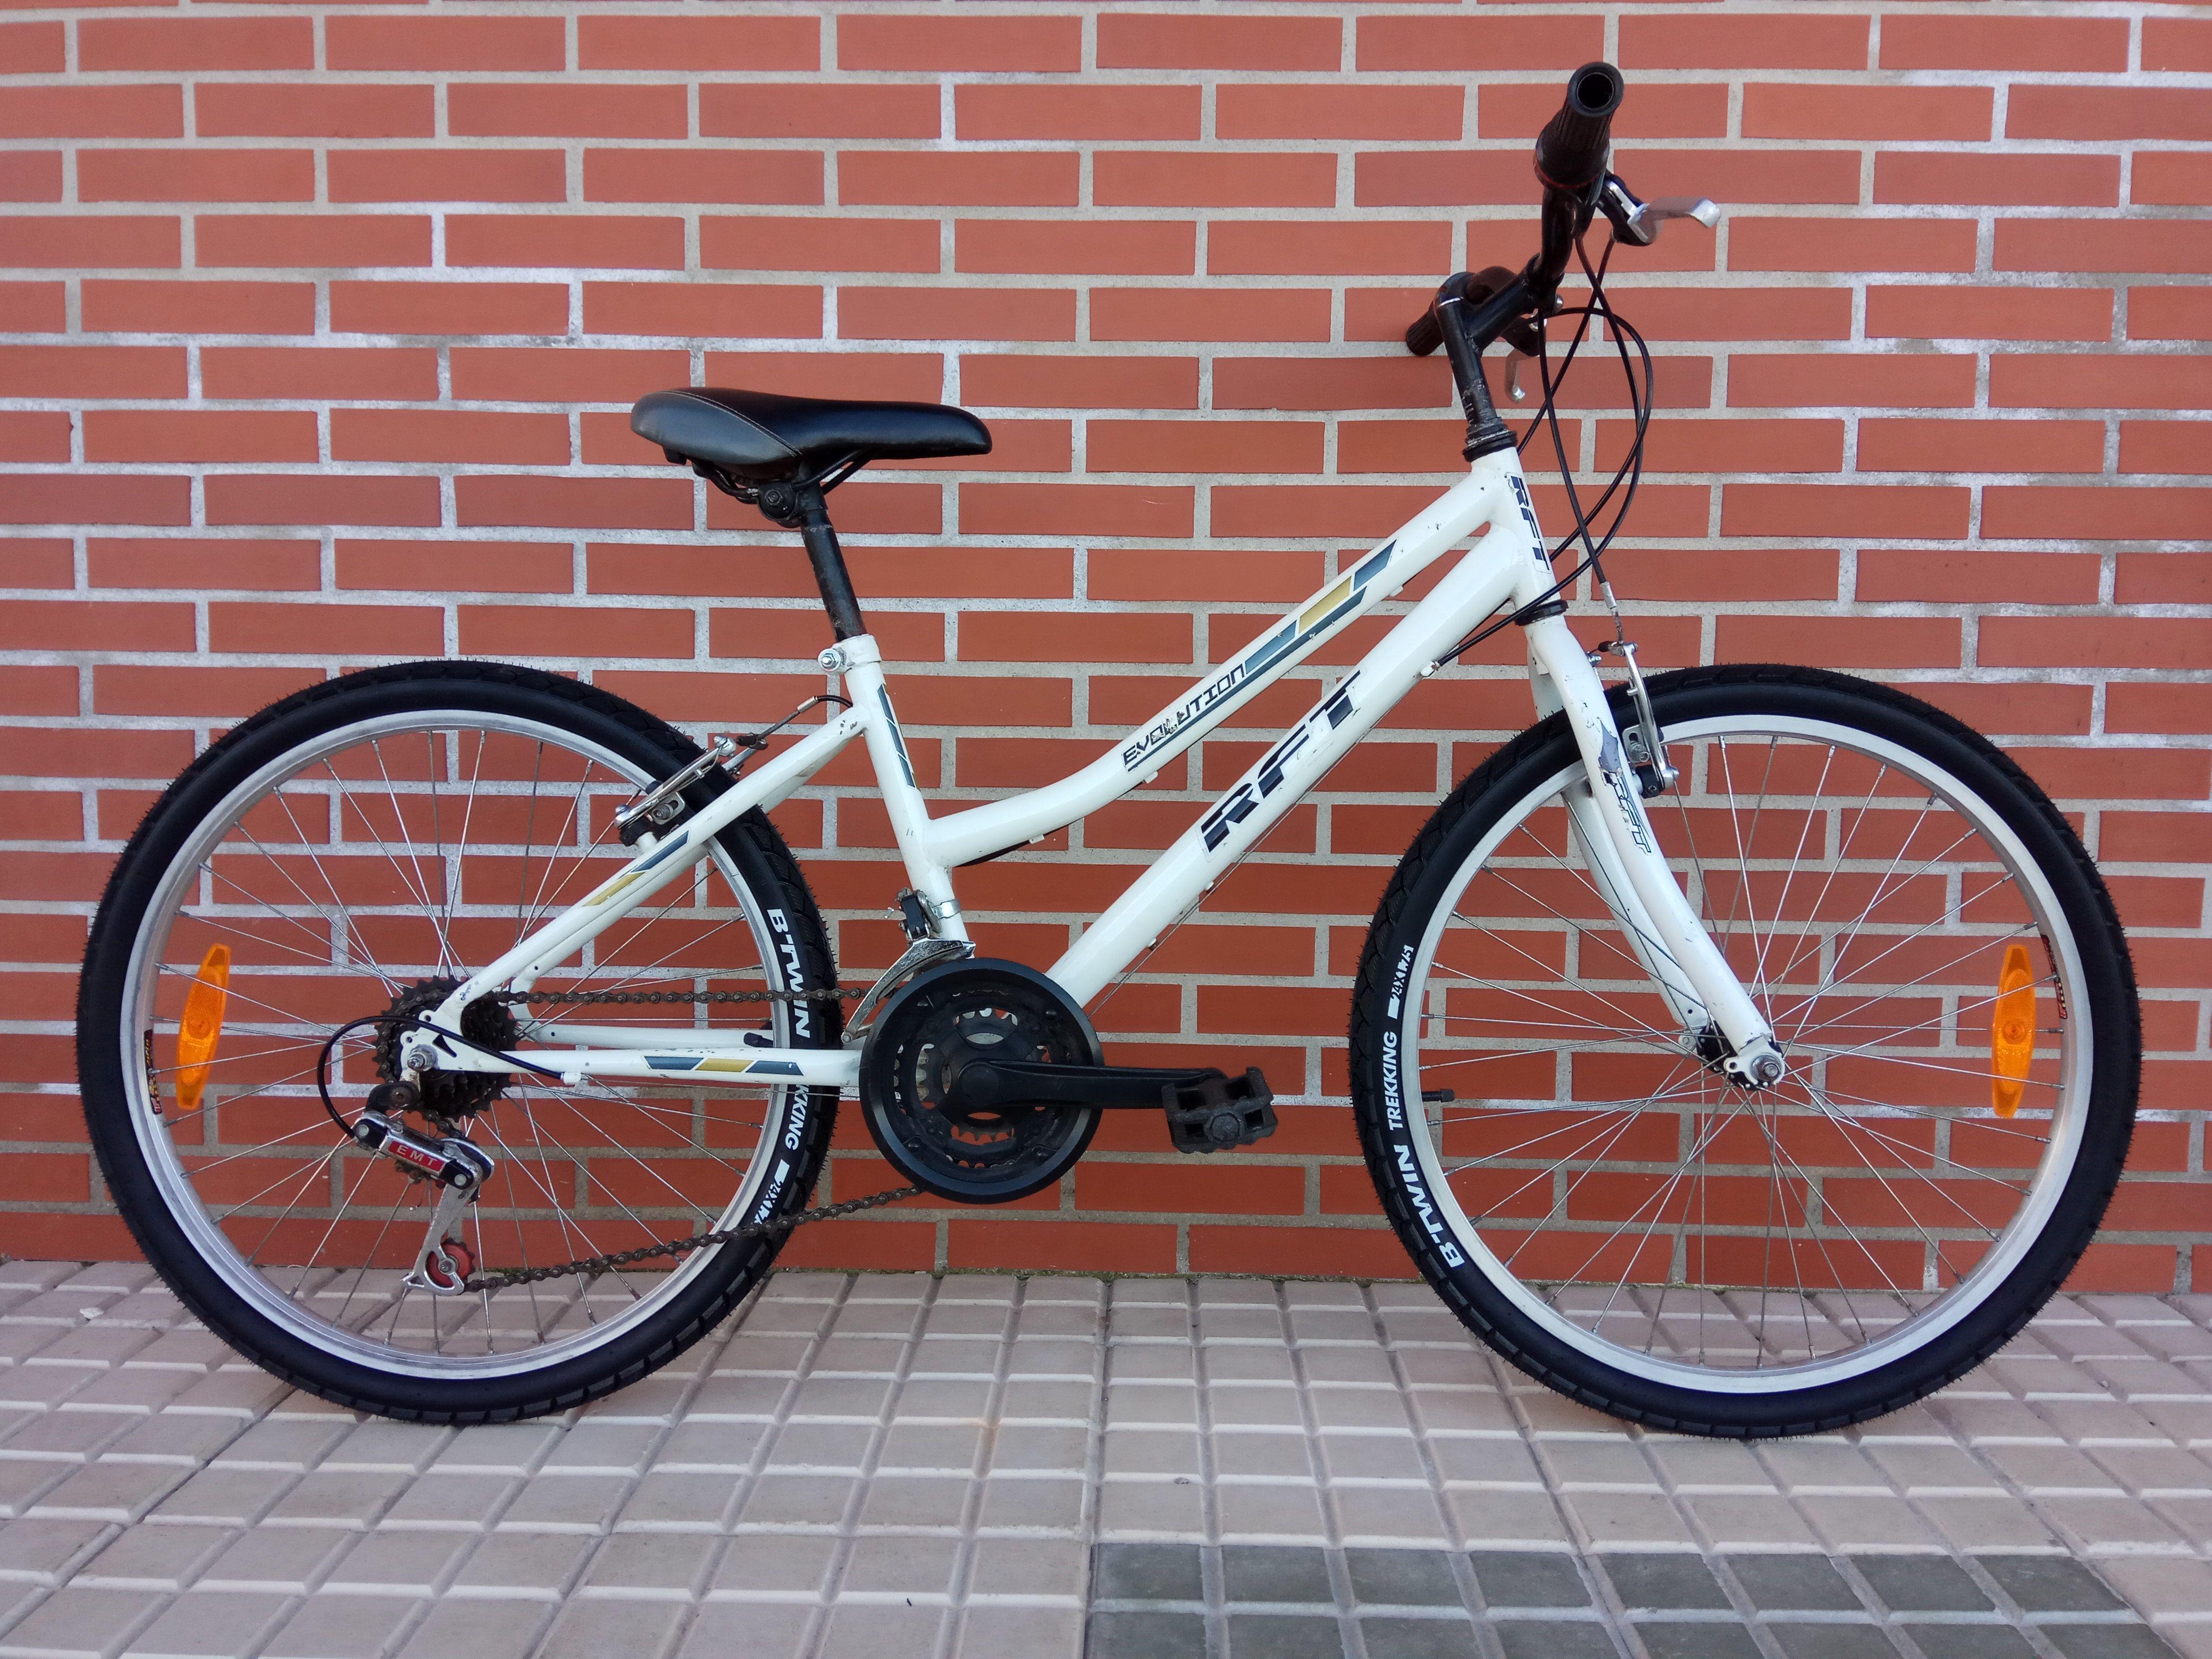 Bicicleta Rft Evolution 90€ MARCA: Rft MODELO: Evolution CLASE ...